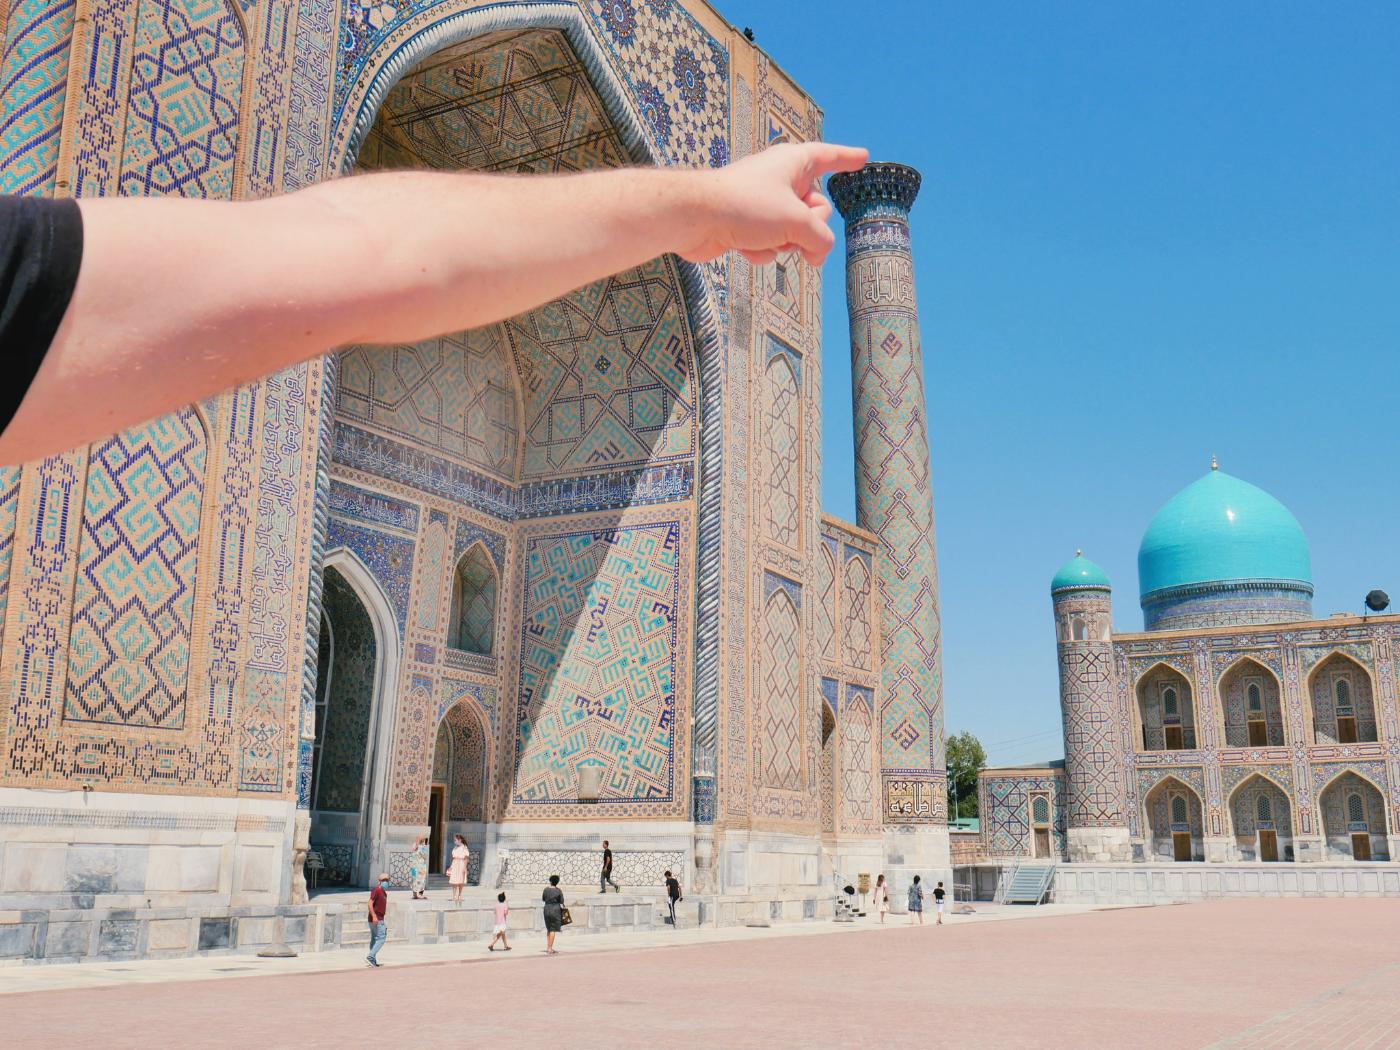 How to Climb the Minaret of the Ulugh Beg Madrasah Registan Samarkand Uzbekistan